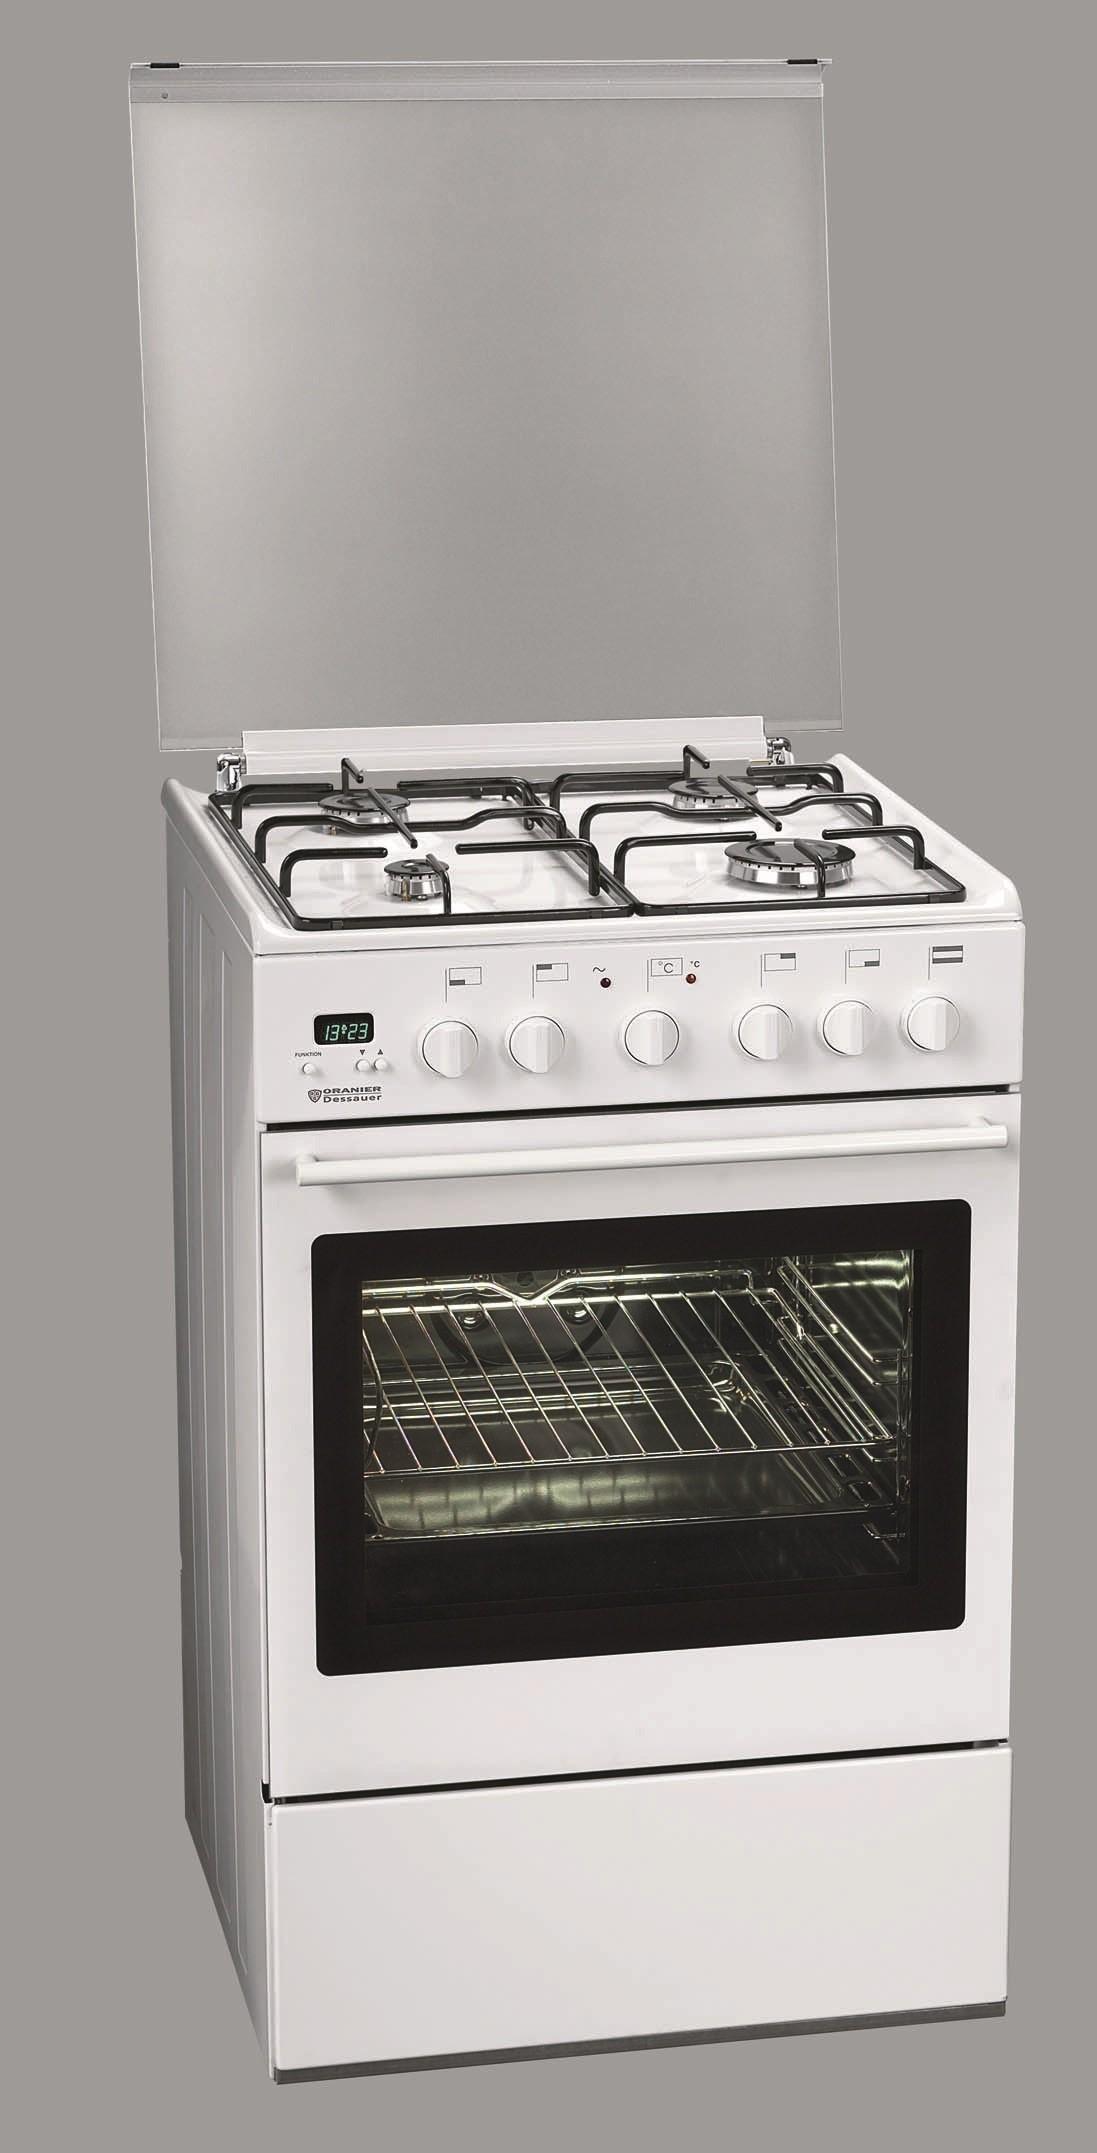 oranier dessa r fue2555 27 gas elektro standherd energieeffizienzklasse b. Black Bedroom Furniture Sets. Home Design Ideas